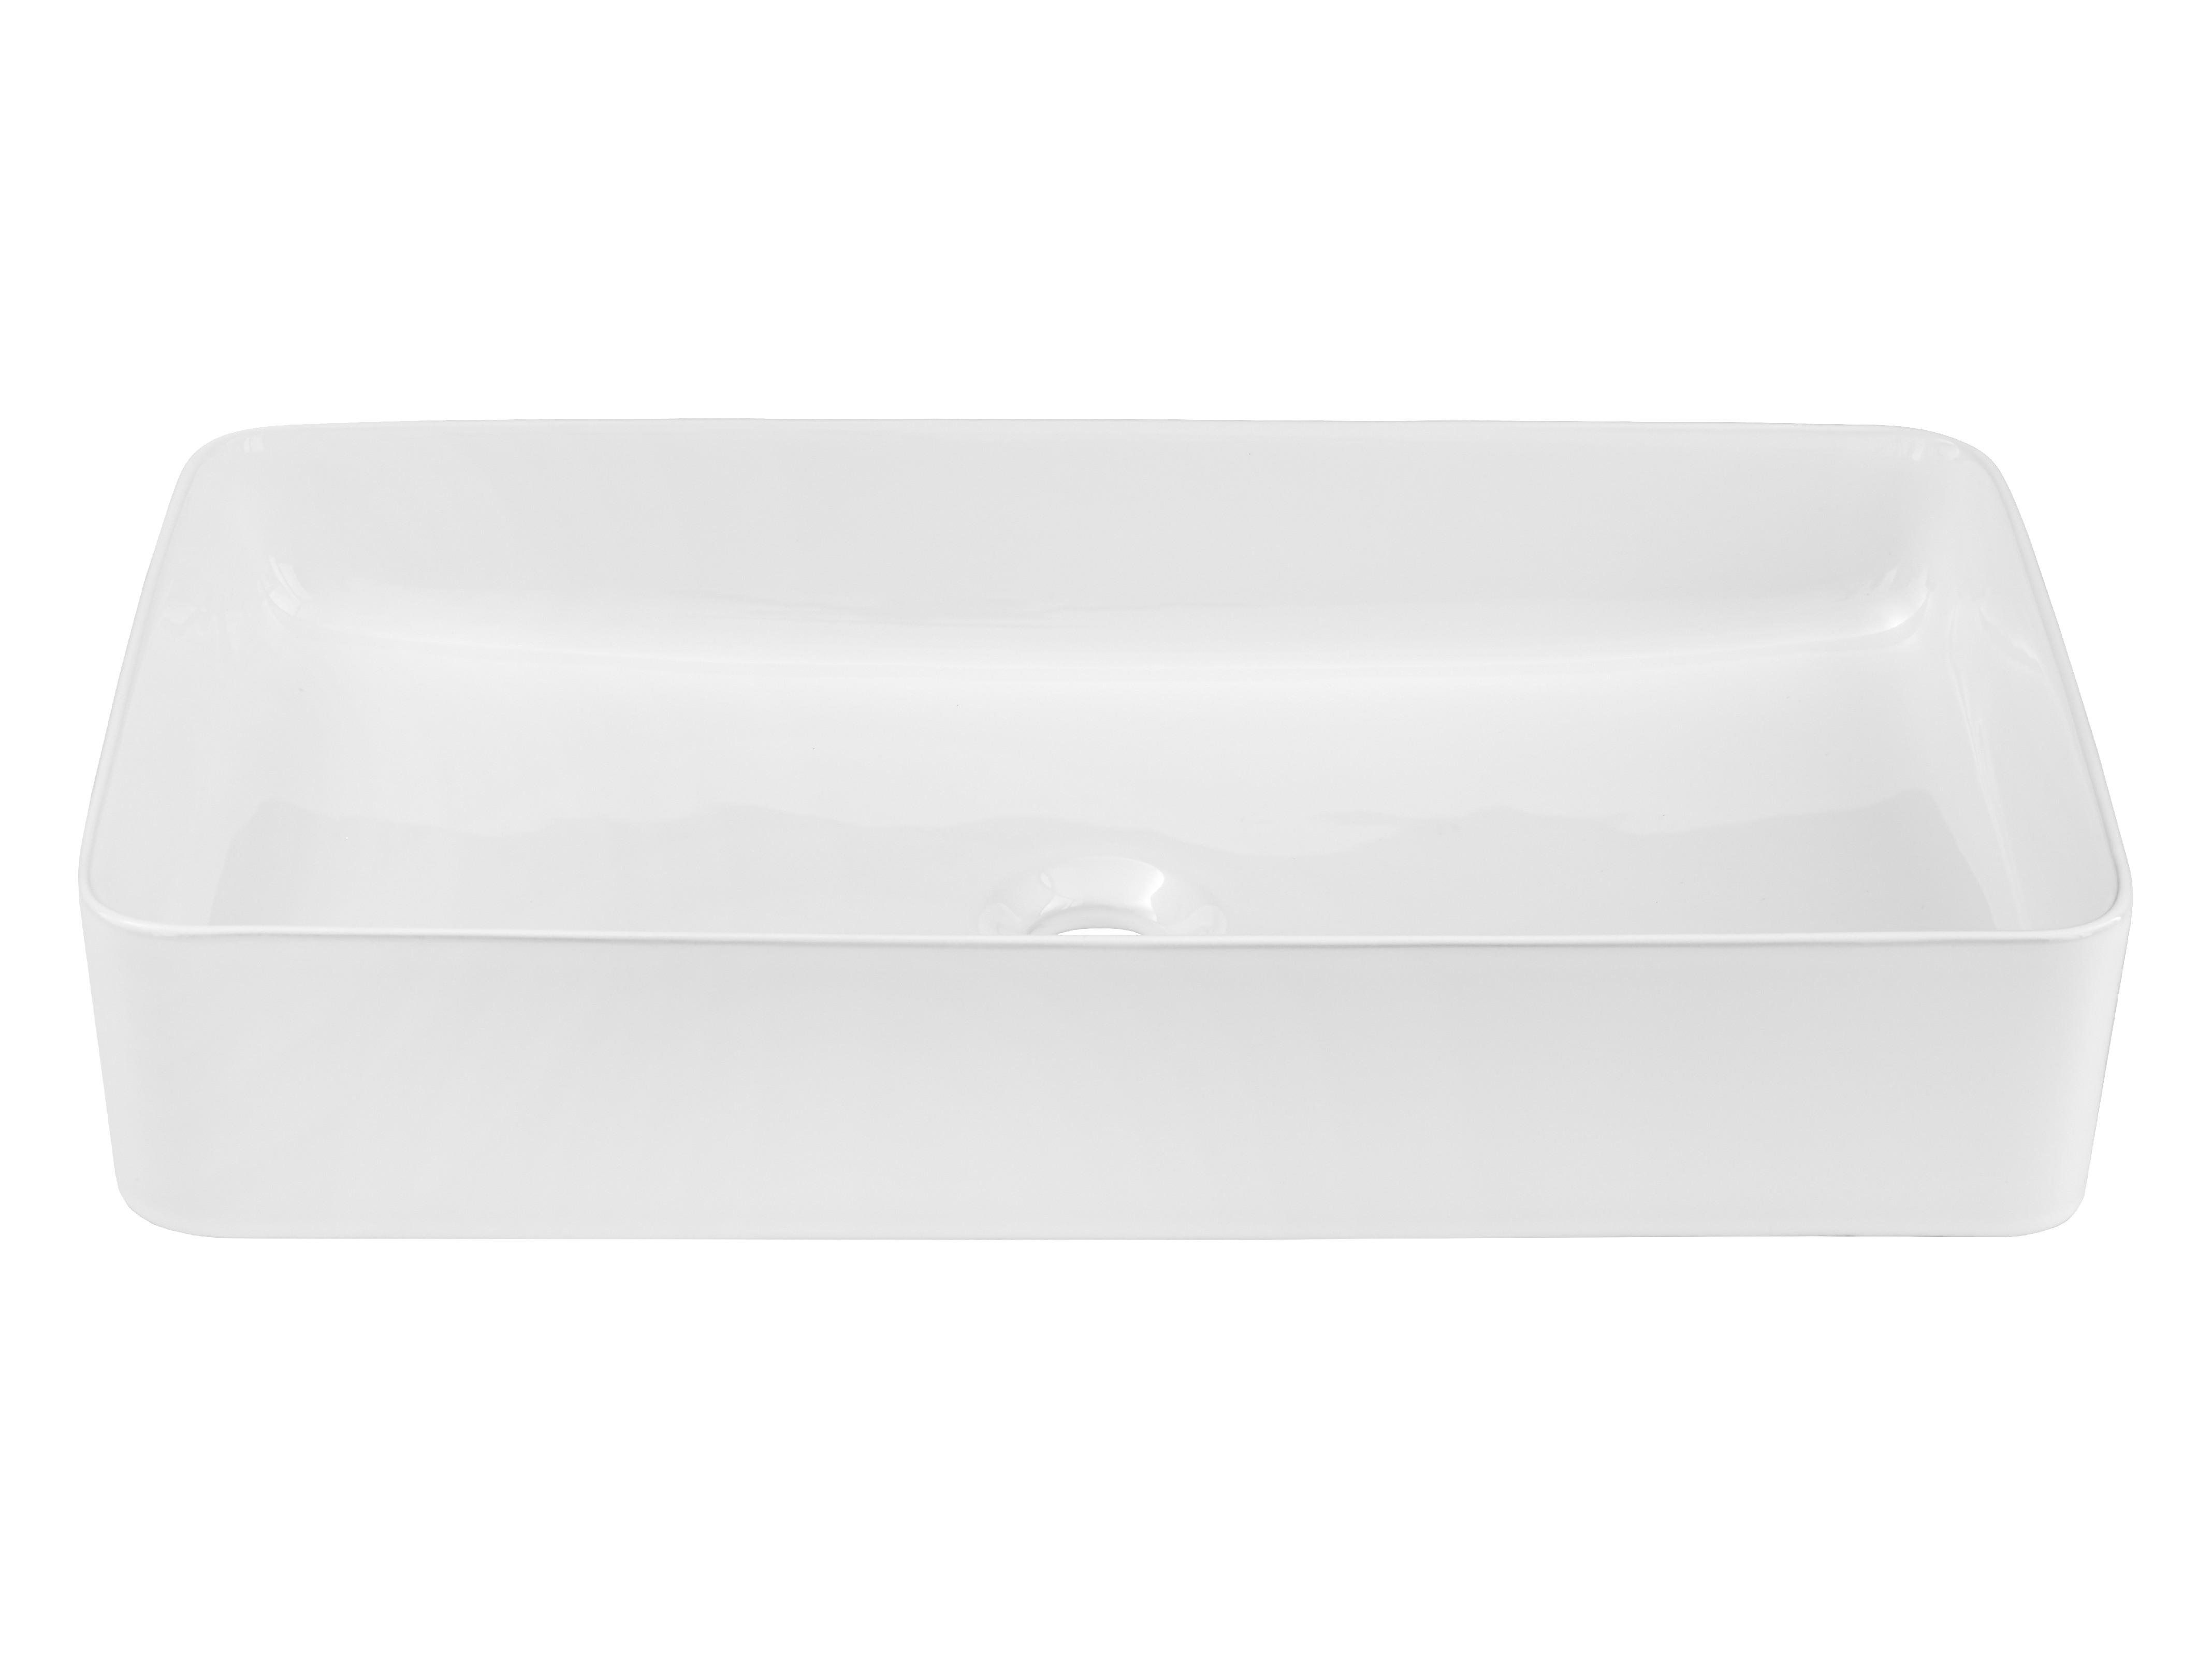 ArtCom Kúpeľňová zostava Manhattan Manhattan: Umývadlo Slim 2 / E-6275 - biele